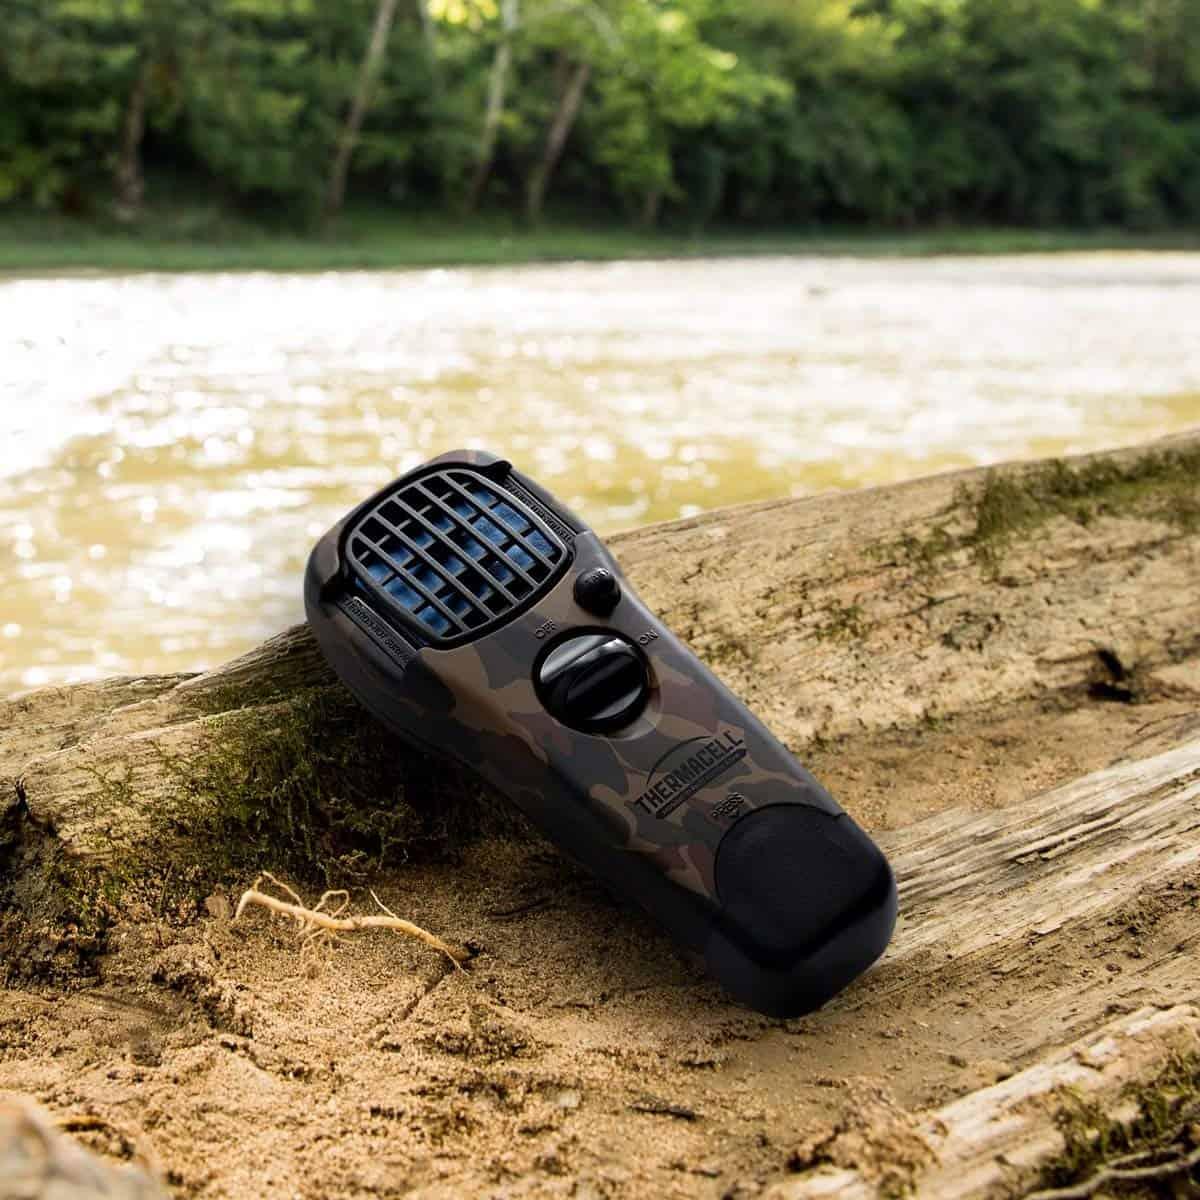 Portable Camo Mosquito Repeller